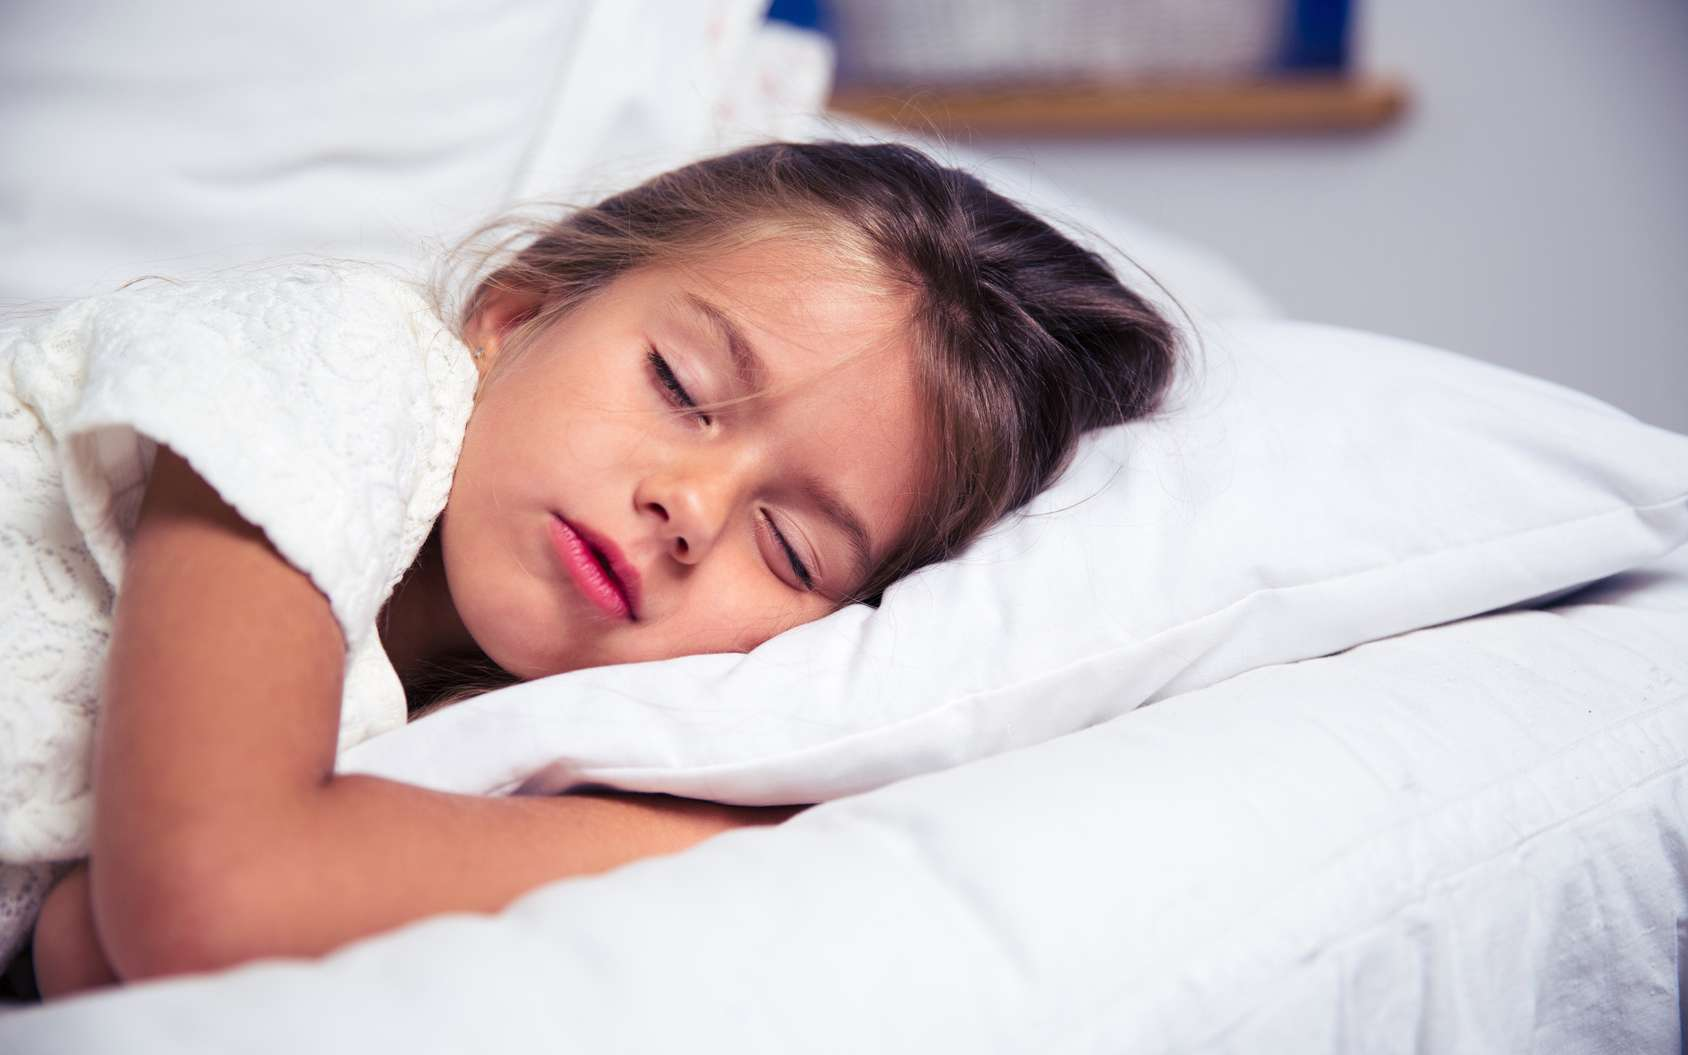 edf5f1dc33_111763_enfant-dormir-coucher-tot